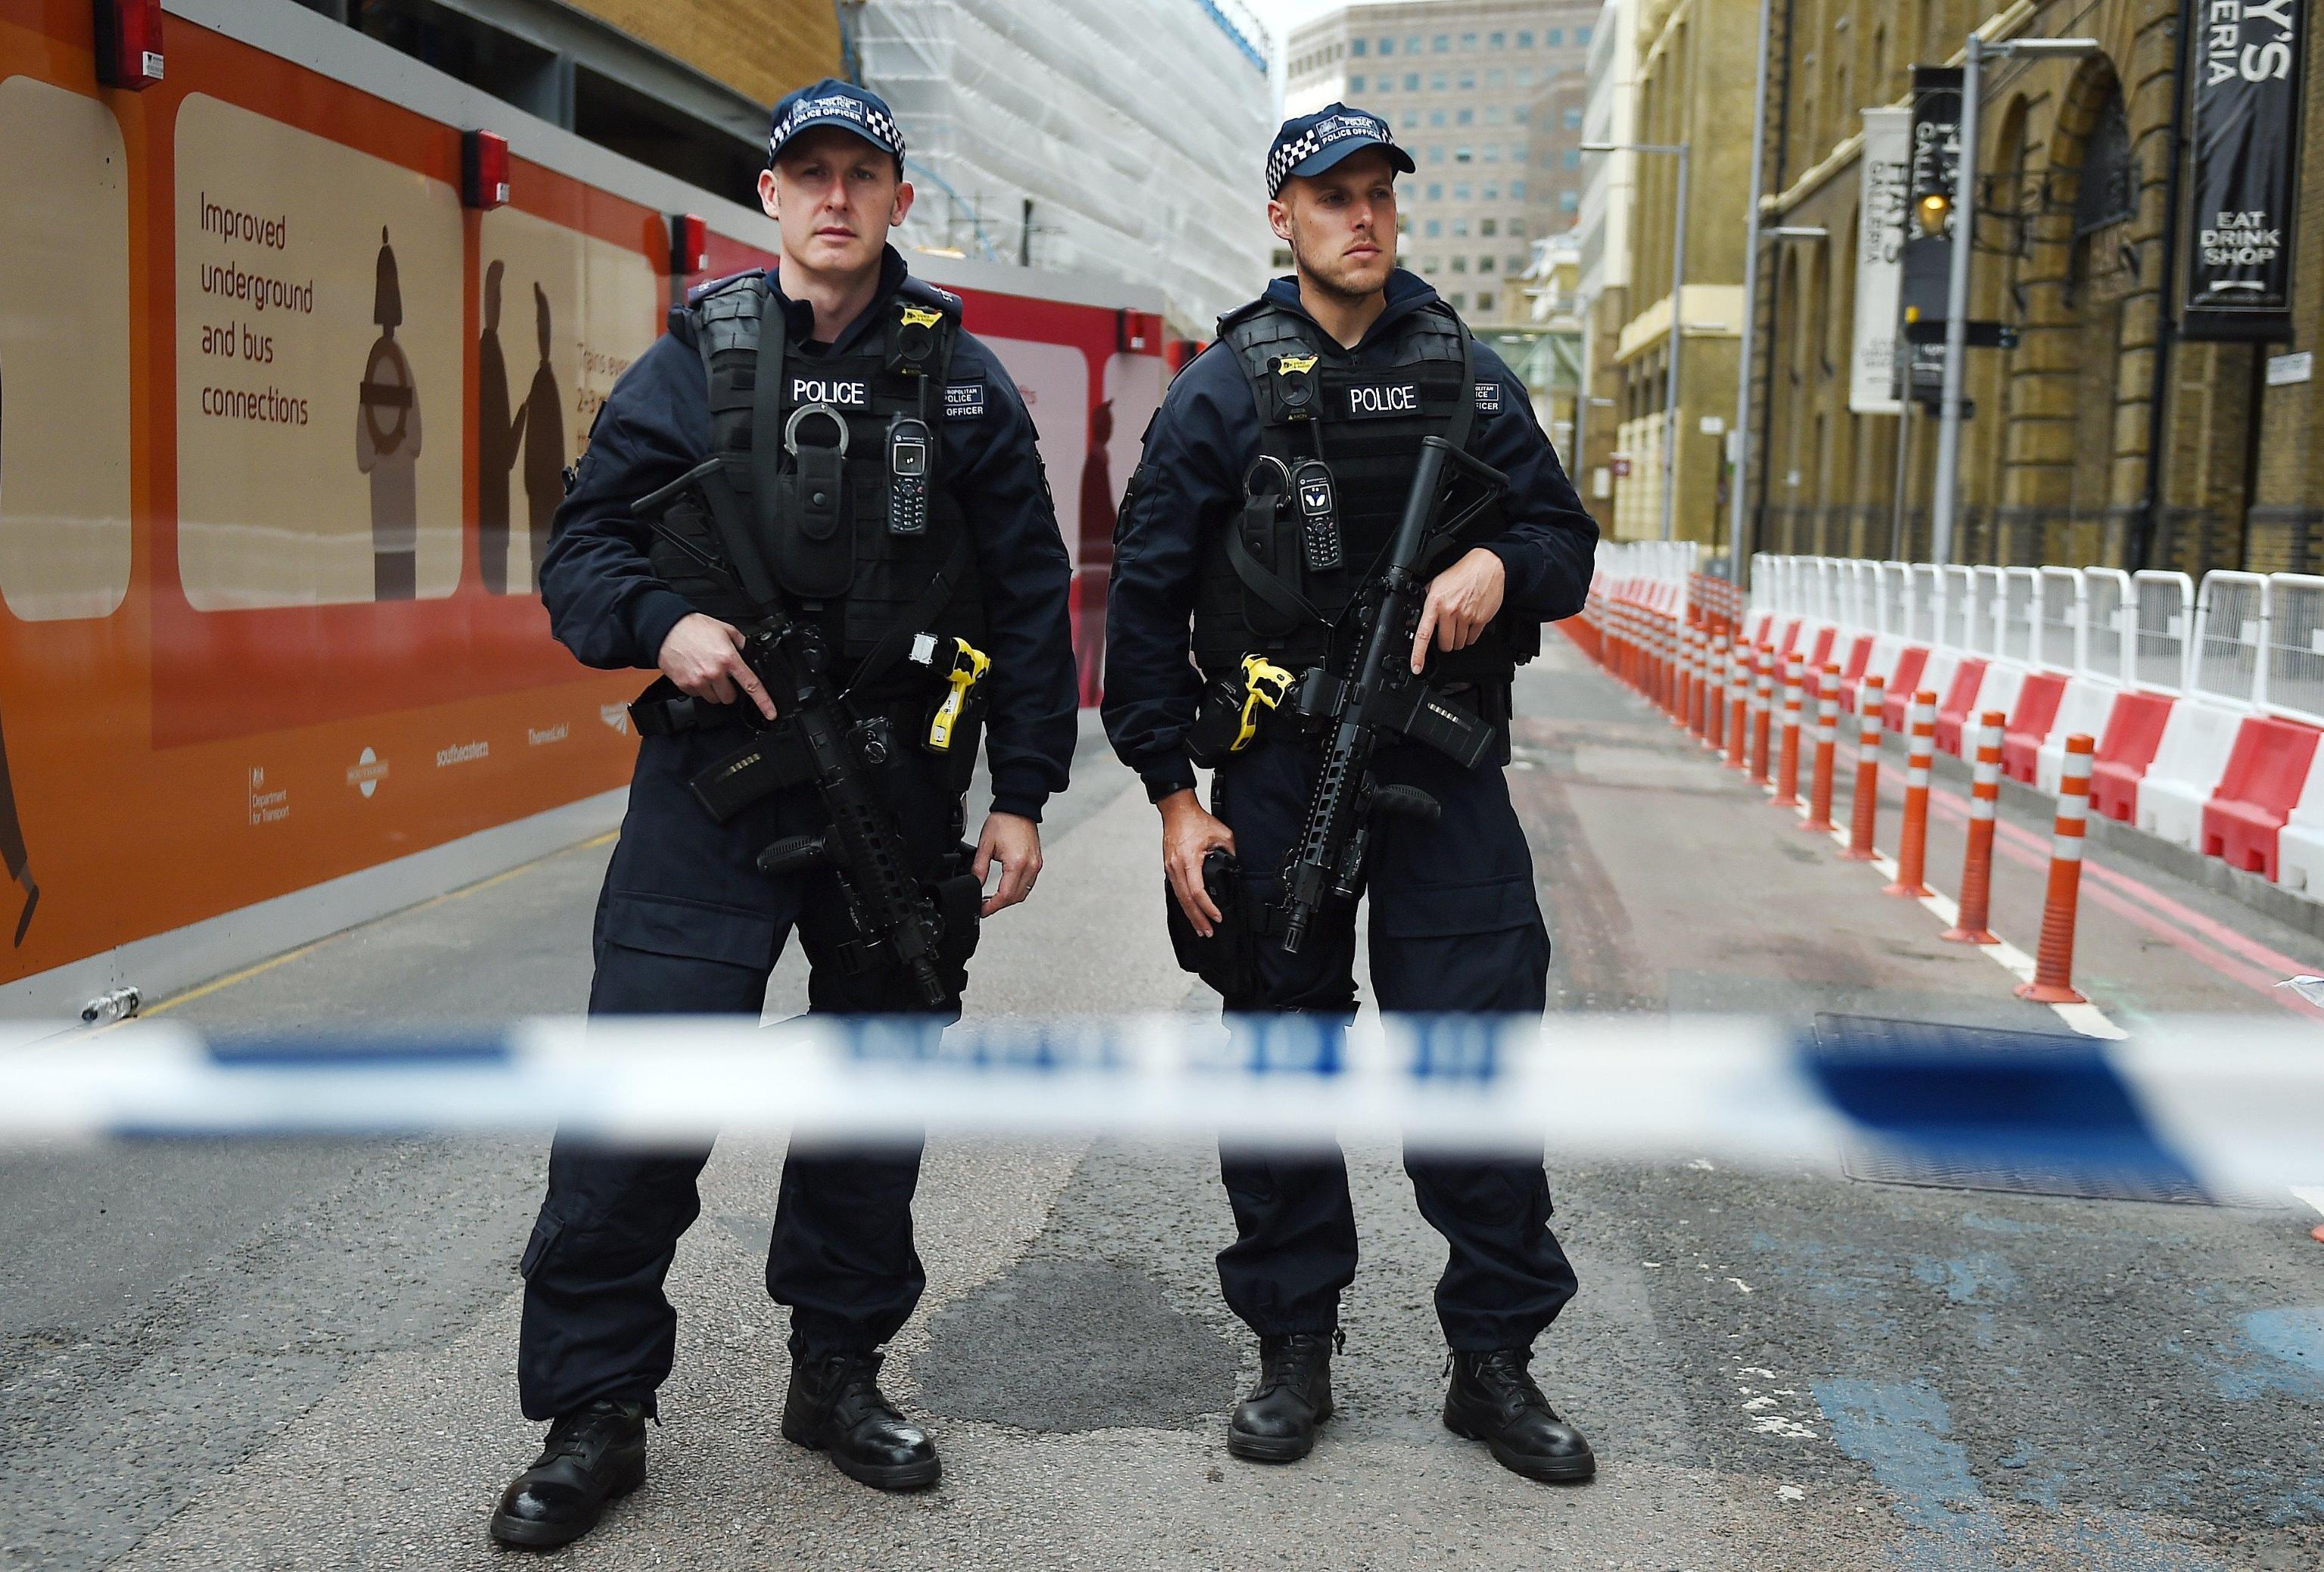 At least seven dead in terrorist incident at London Bridge and Borough Market